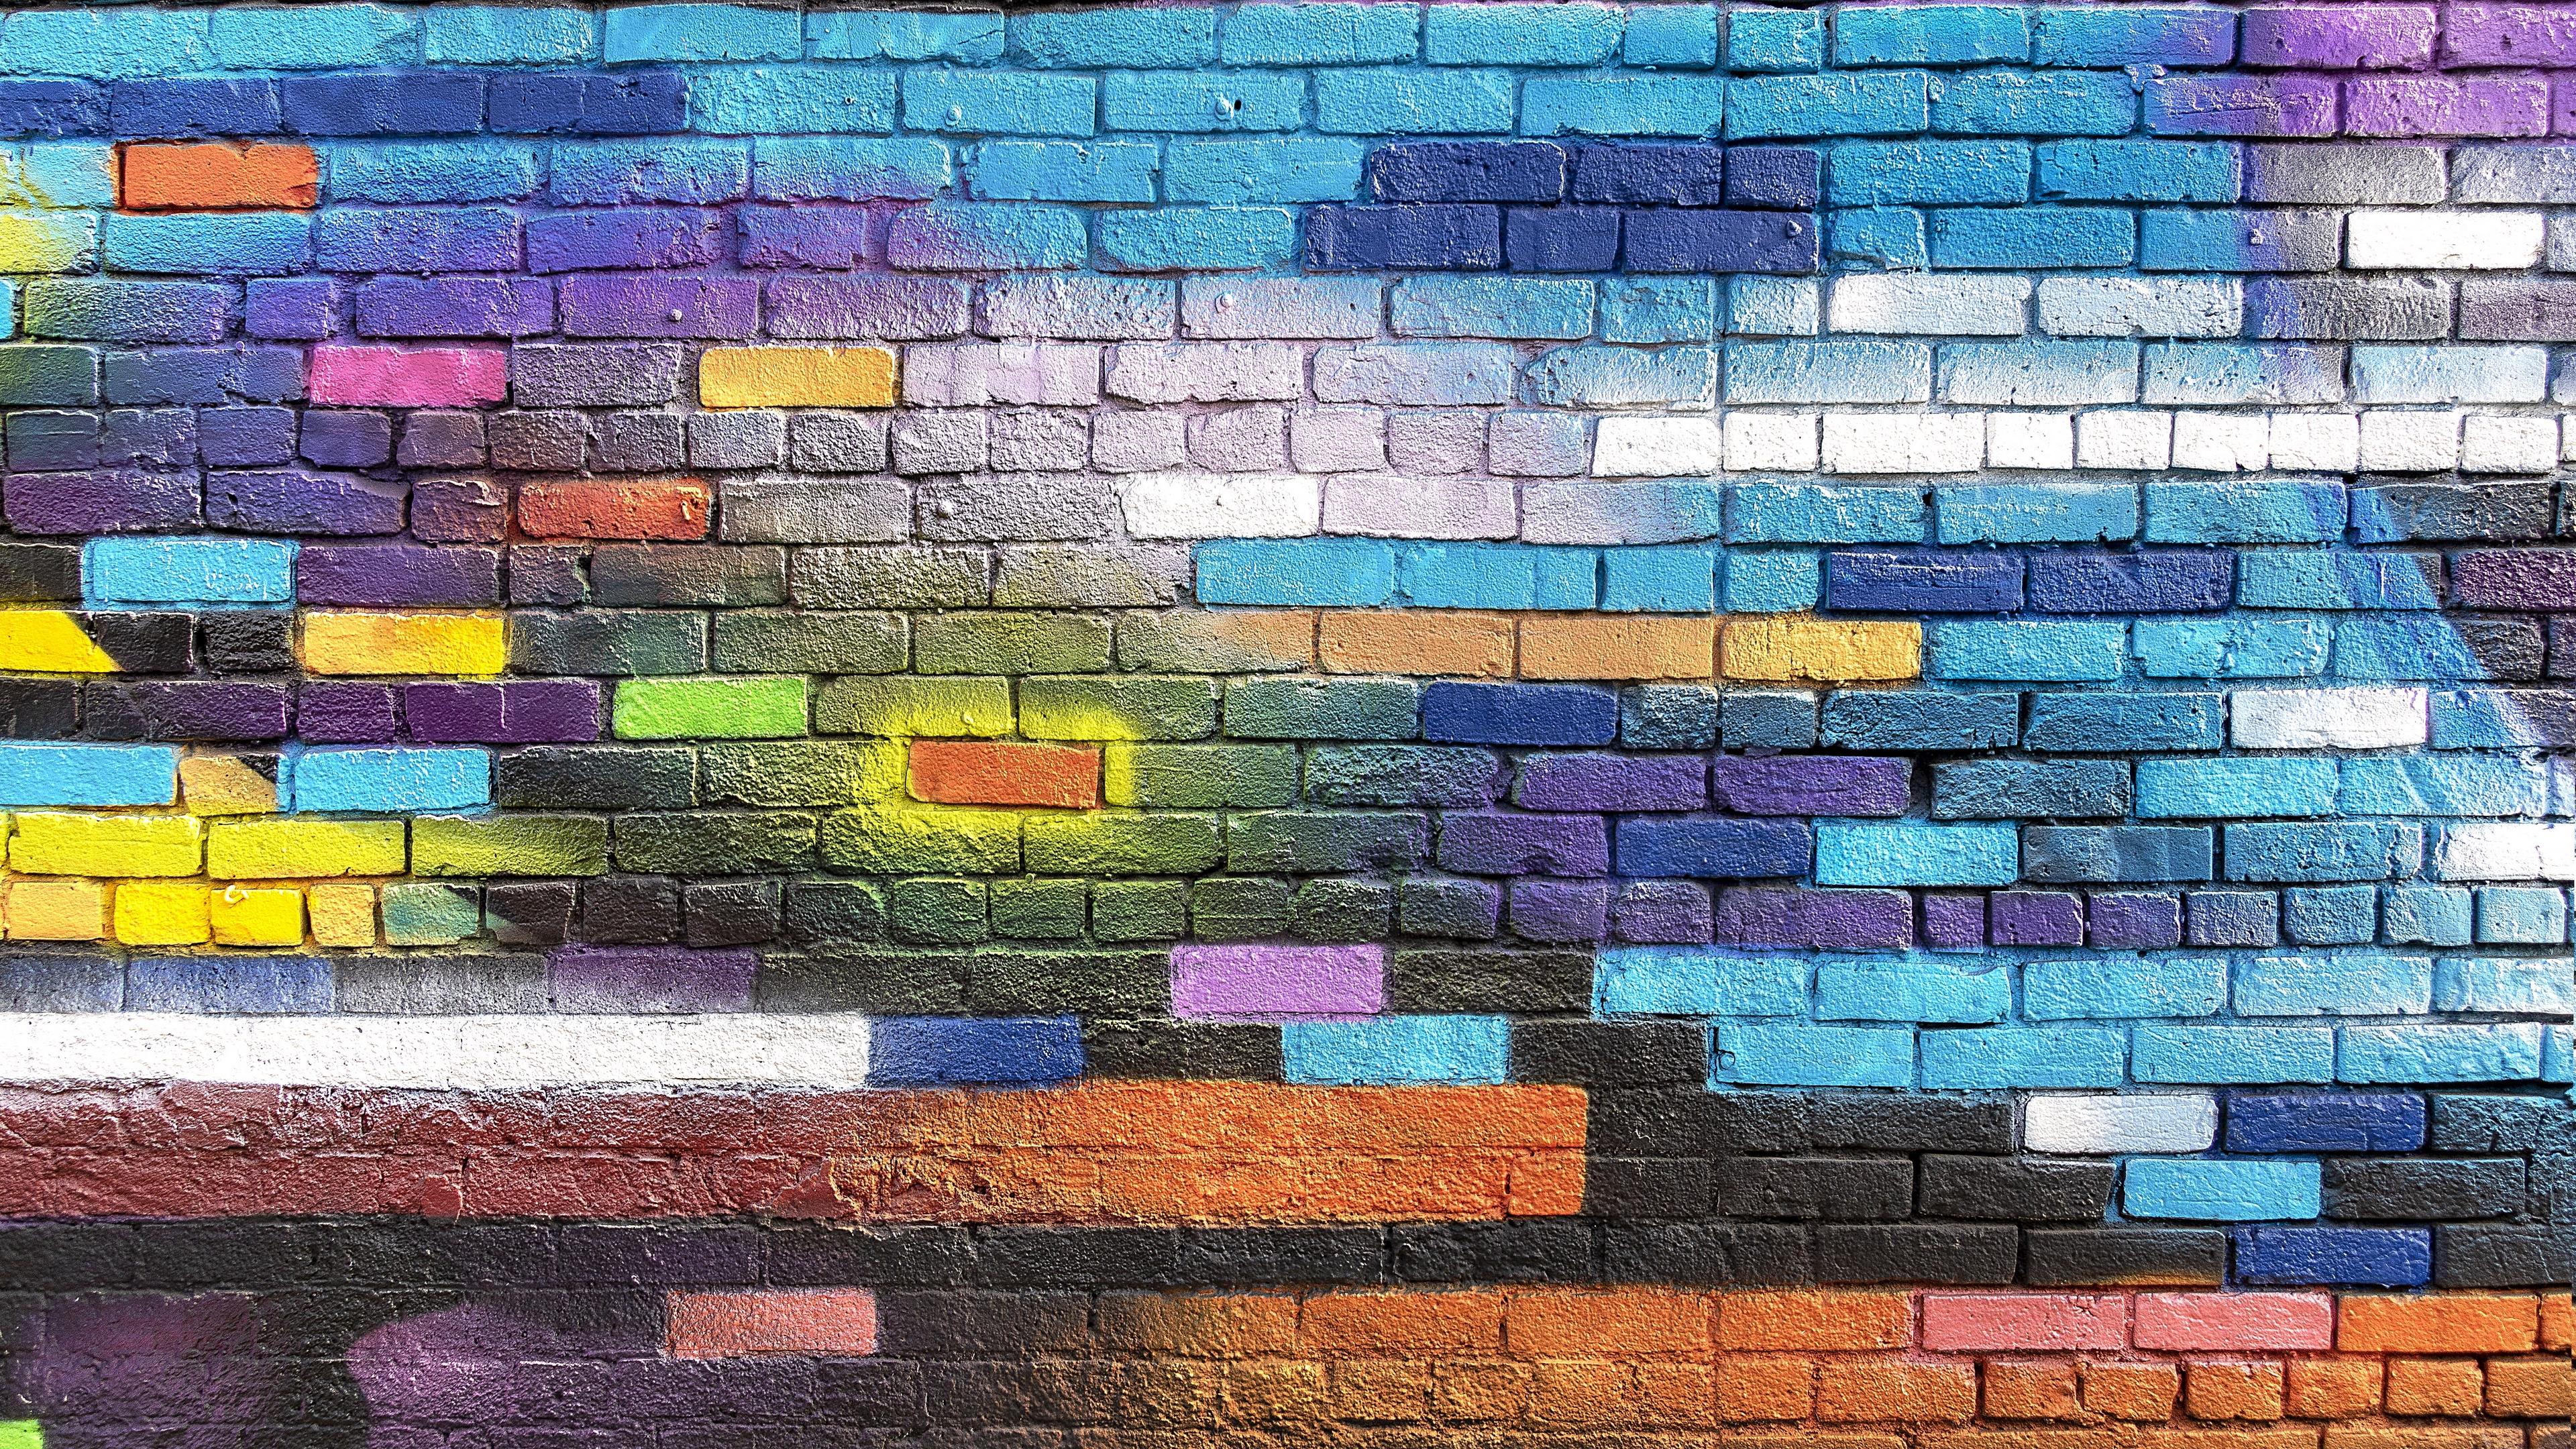 wall brick colorful paint street art graffiti 4k 1536097892 - wall, brick, colorful, paint, street art, graffiti 4k - WALL, Colorful, brick